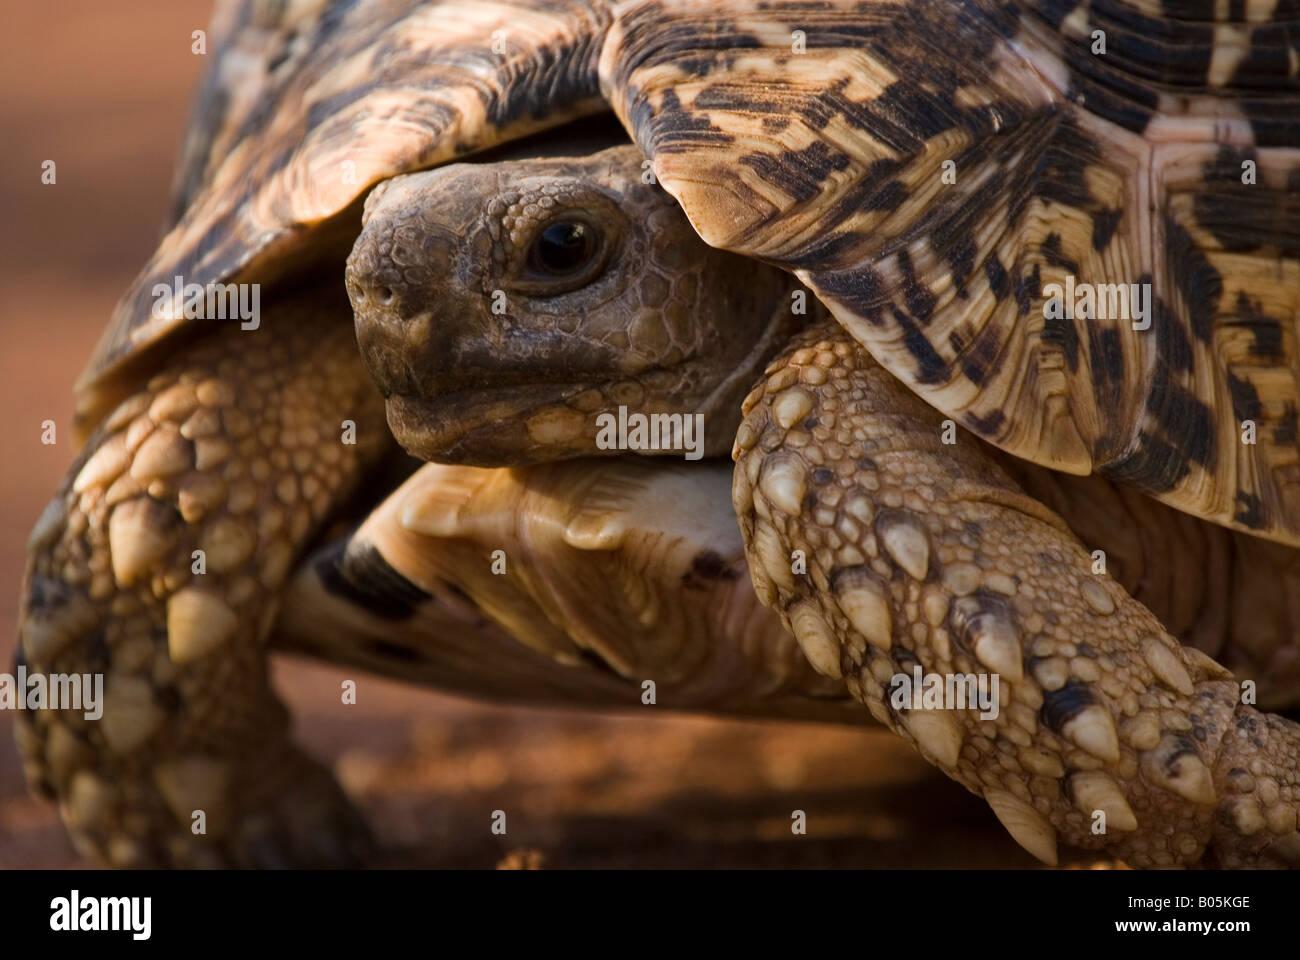 A leopard tortoise Geochelone Pardalis - Stock Image